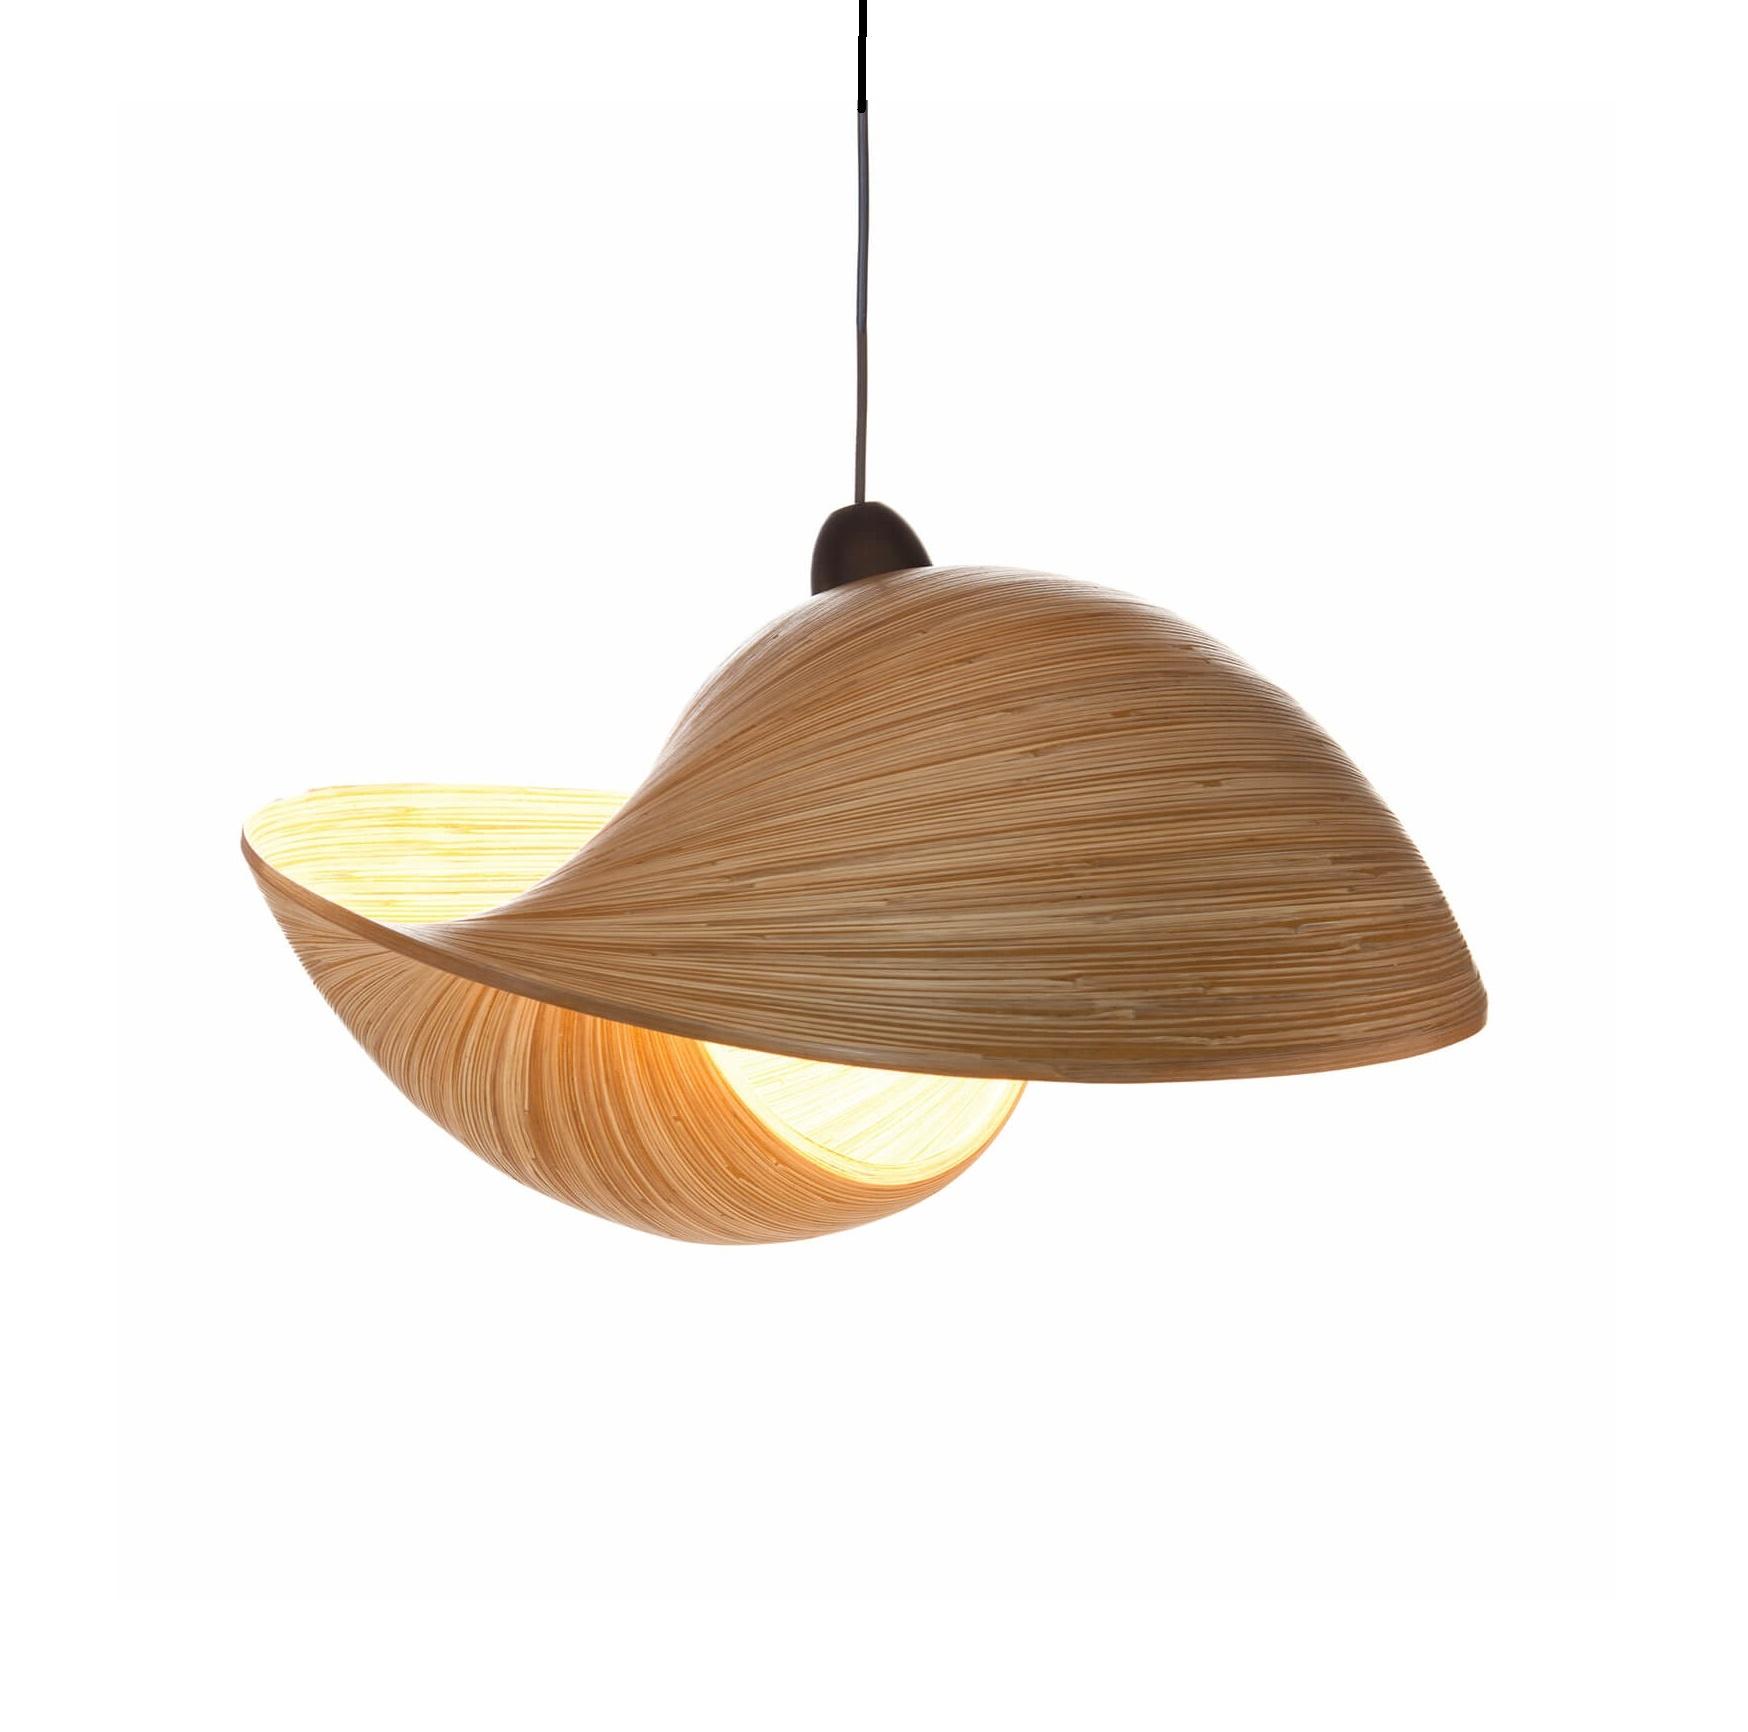 Hanglamp Bamboo Shell 50cm |  | 7061283498321